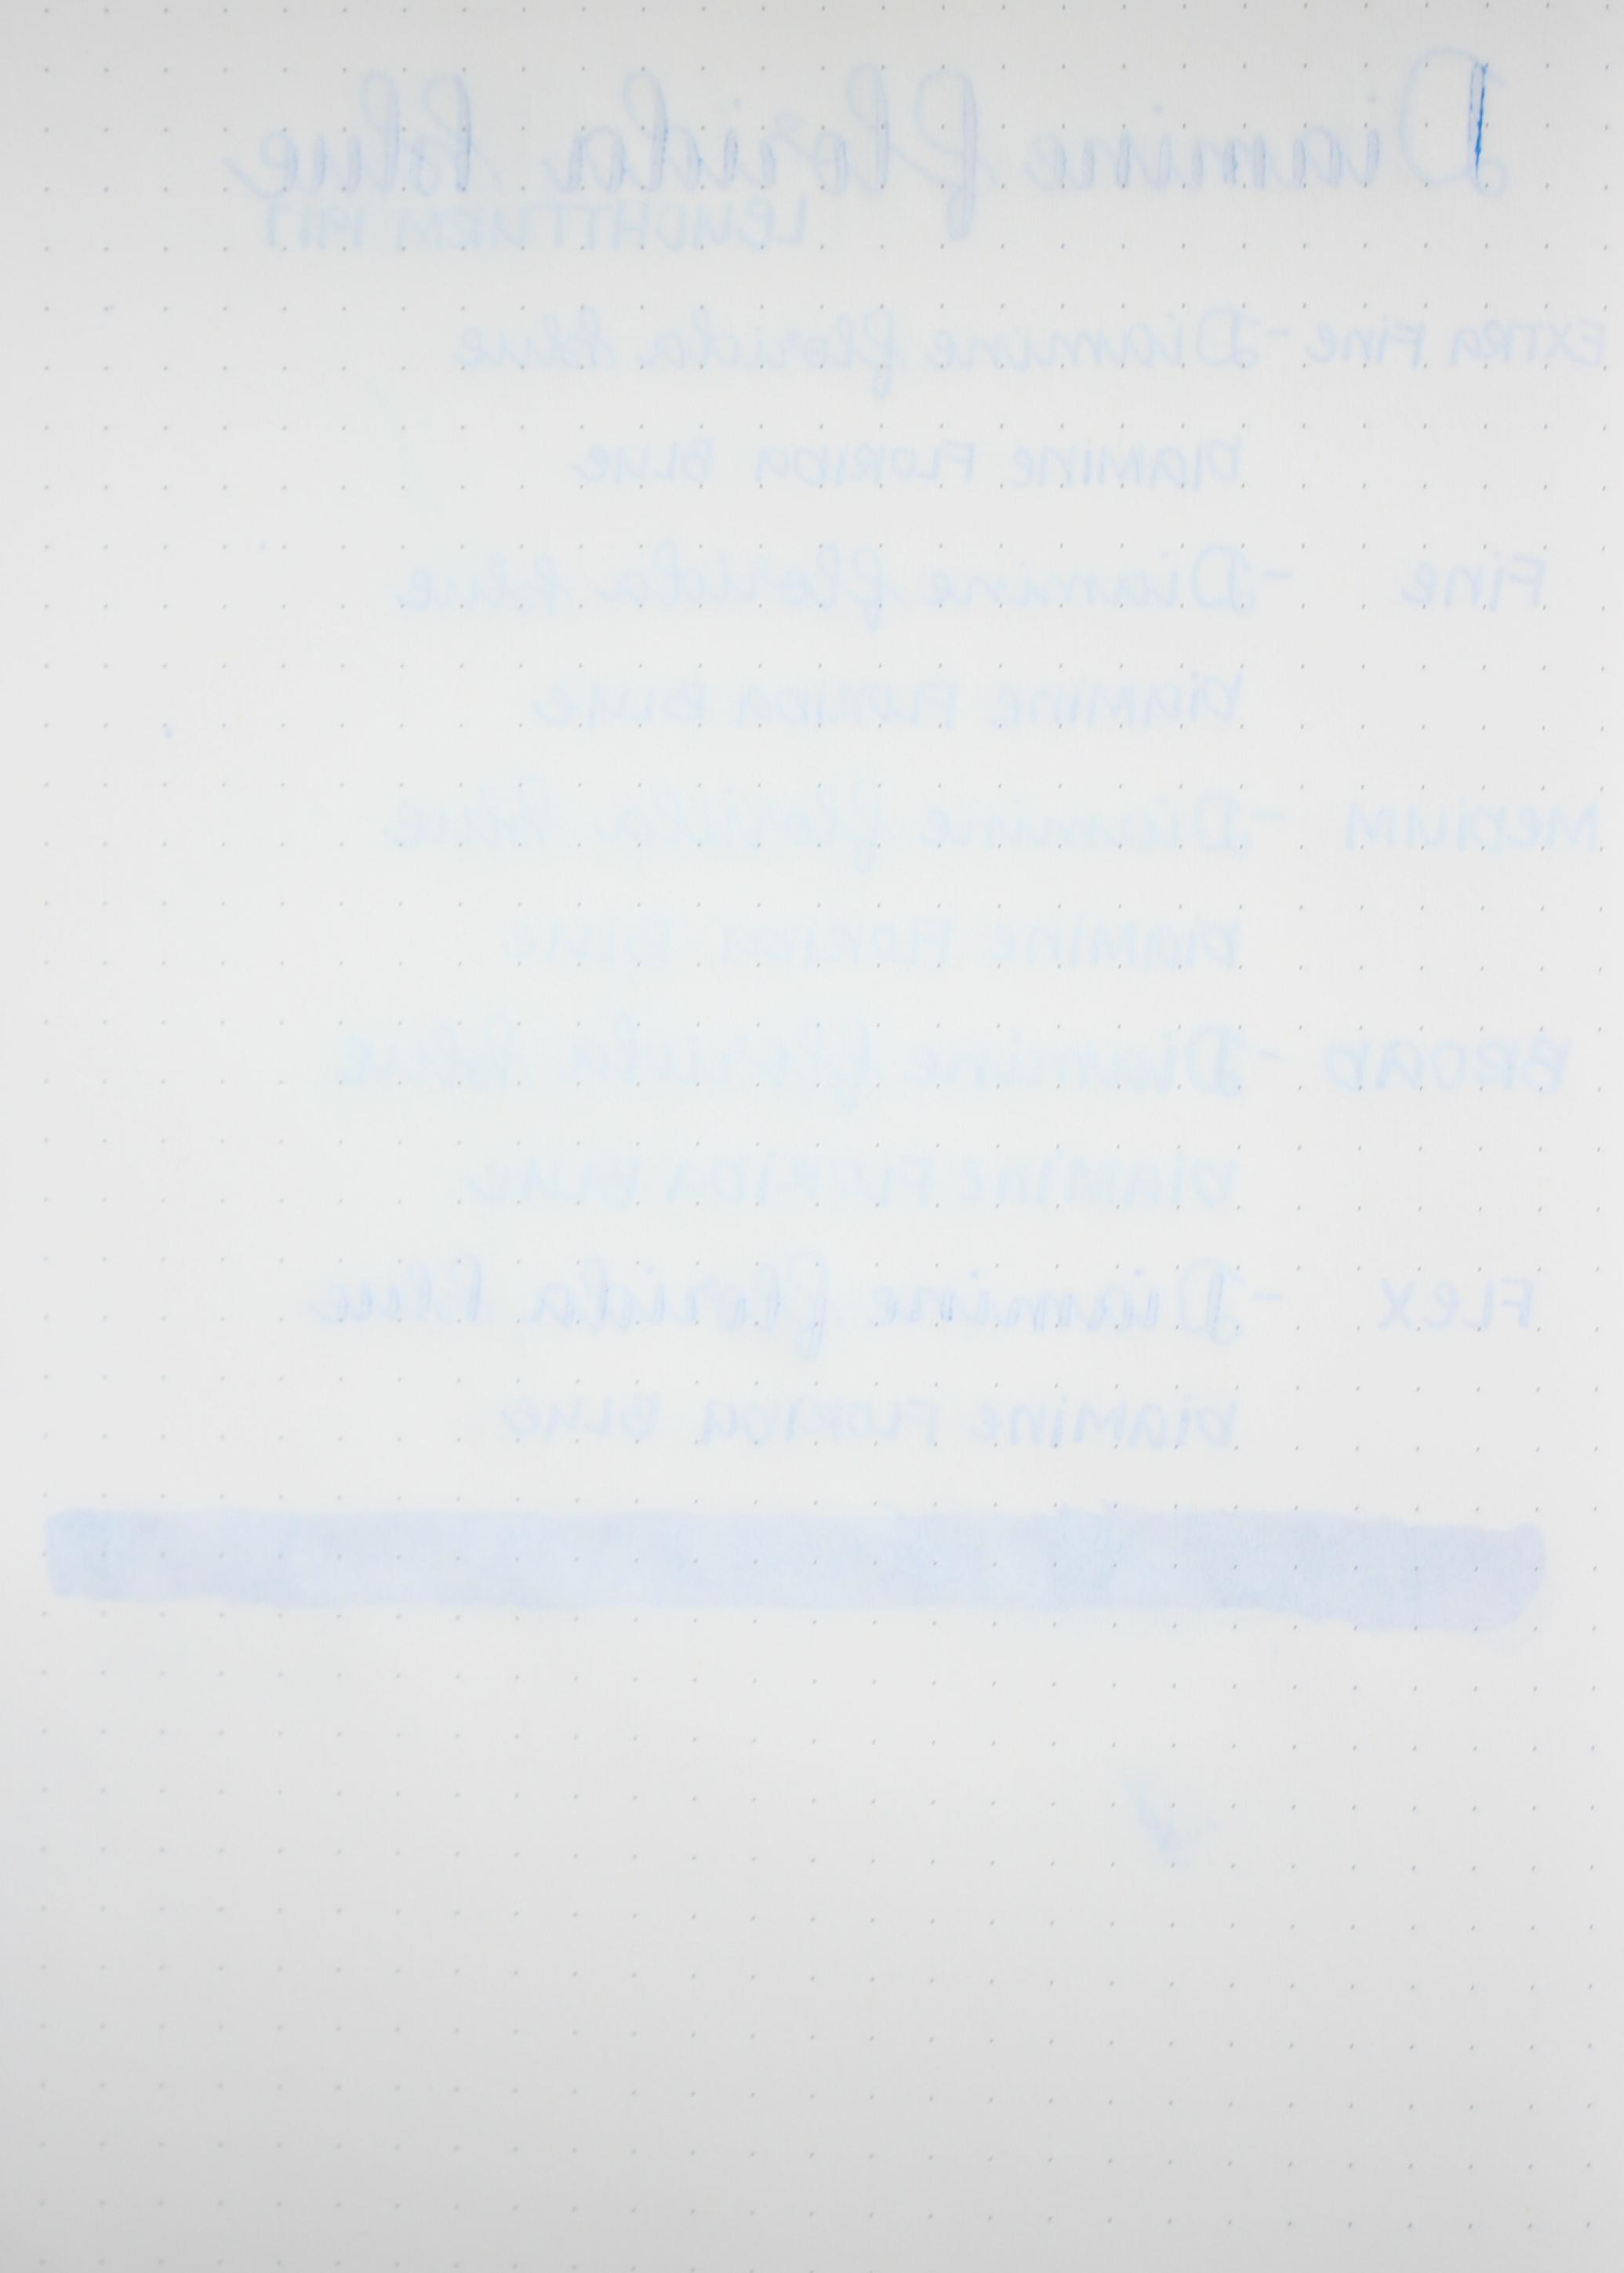 DiamineFloridaBlue-015.jpg